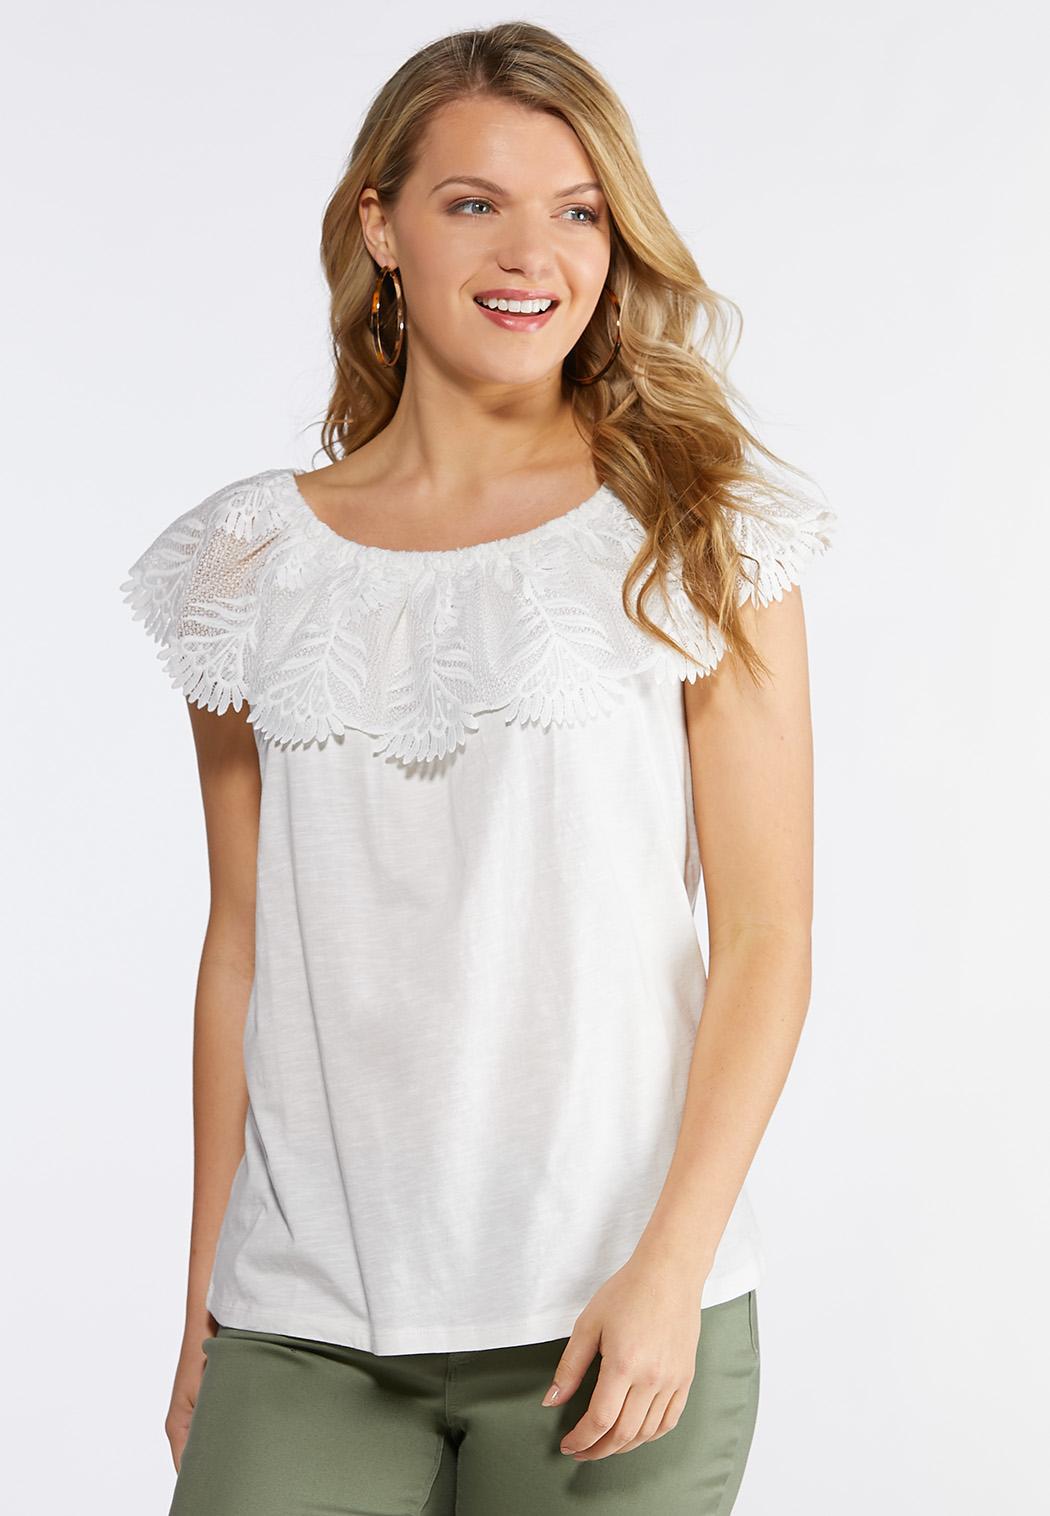 7d263a5572fdd Plus Size Floral Lace Off The Shoulder Top Tanks   Camis Cato Fashions